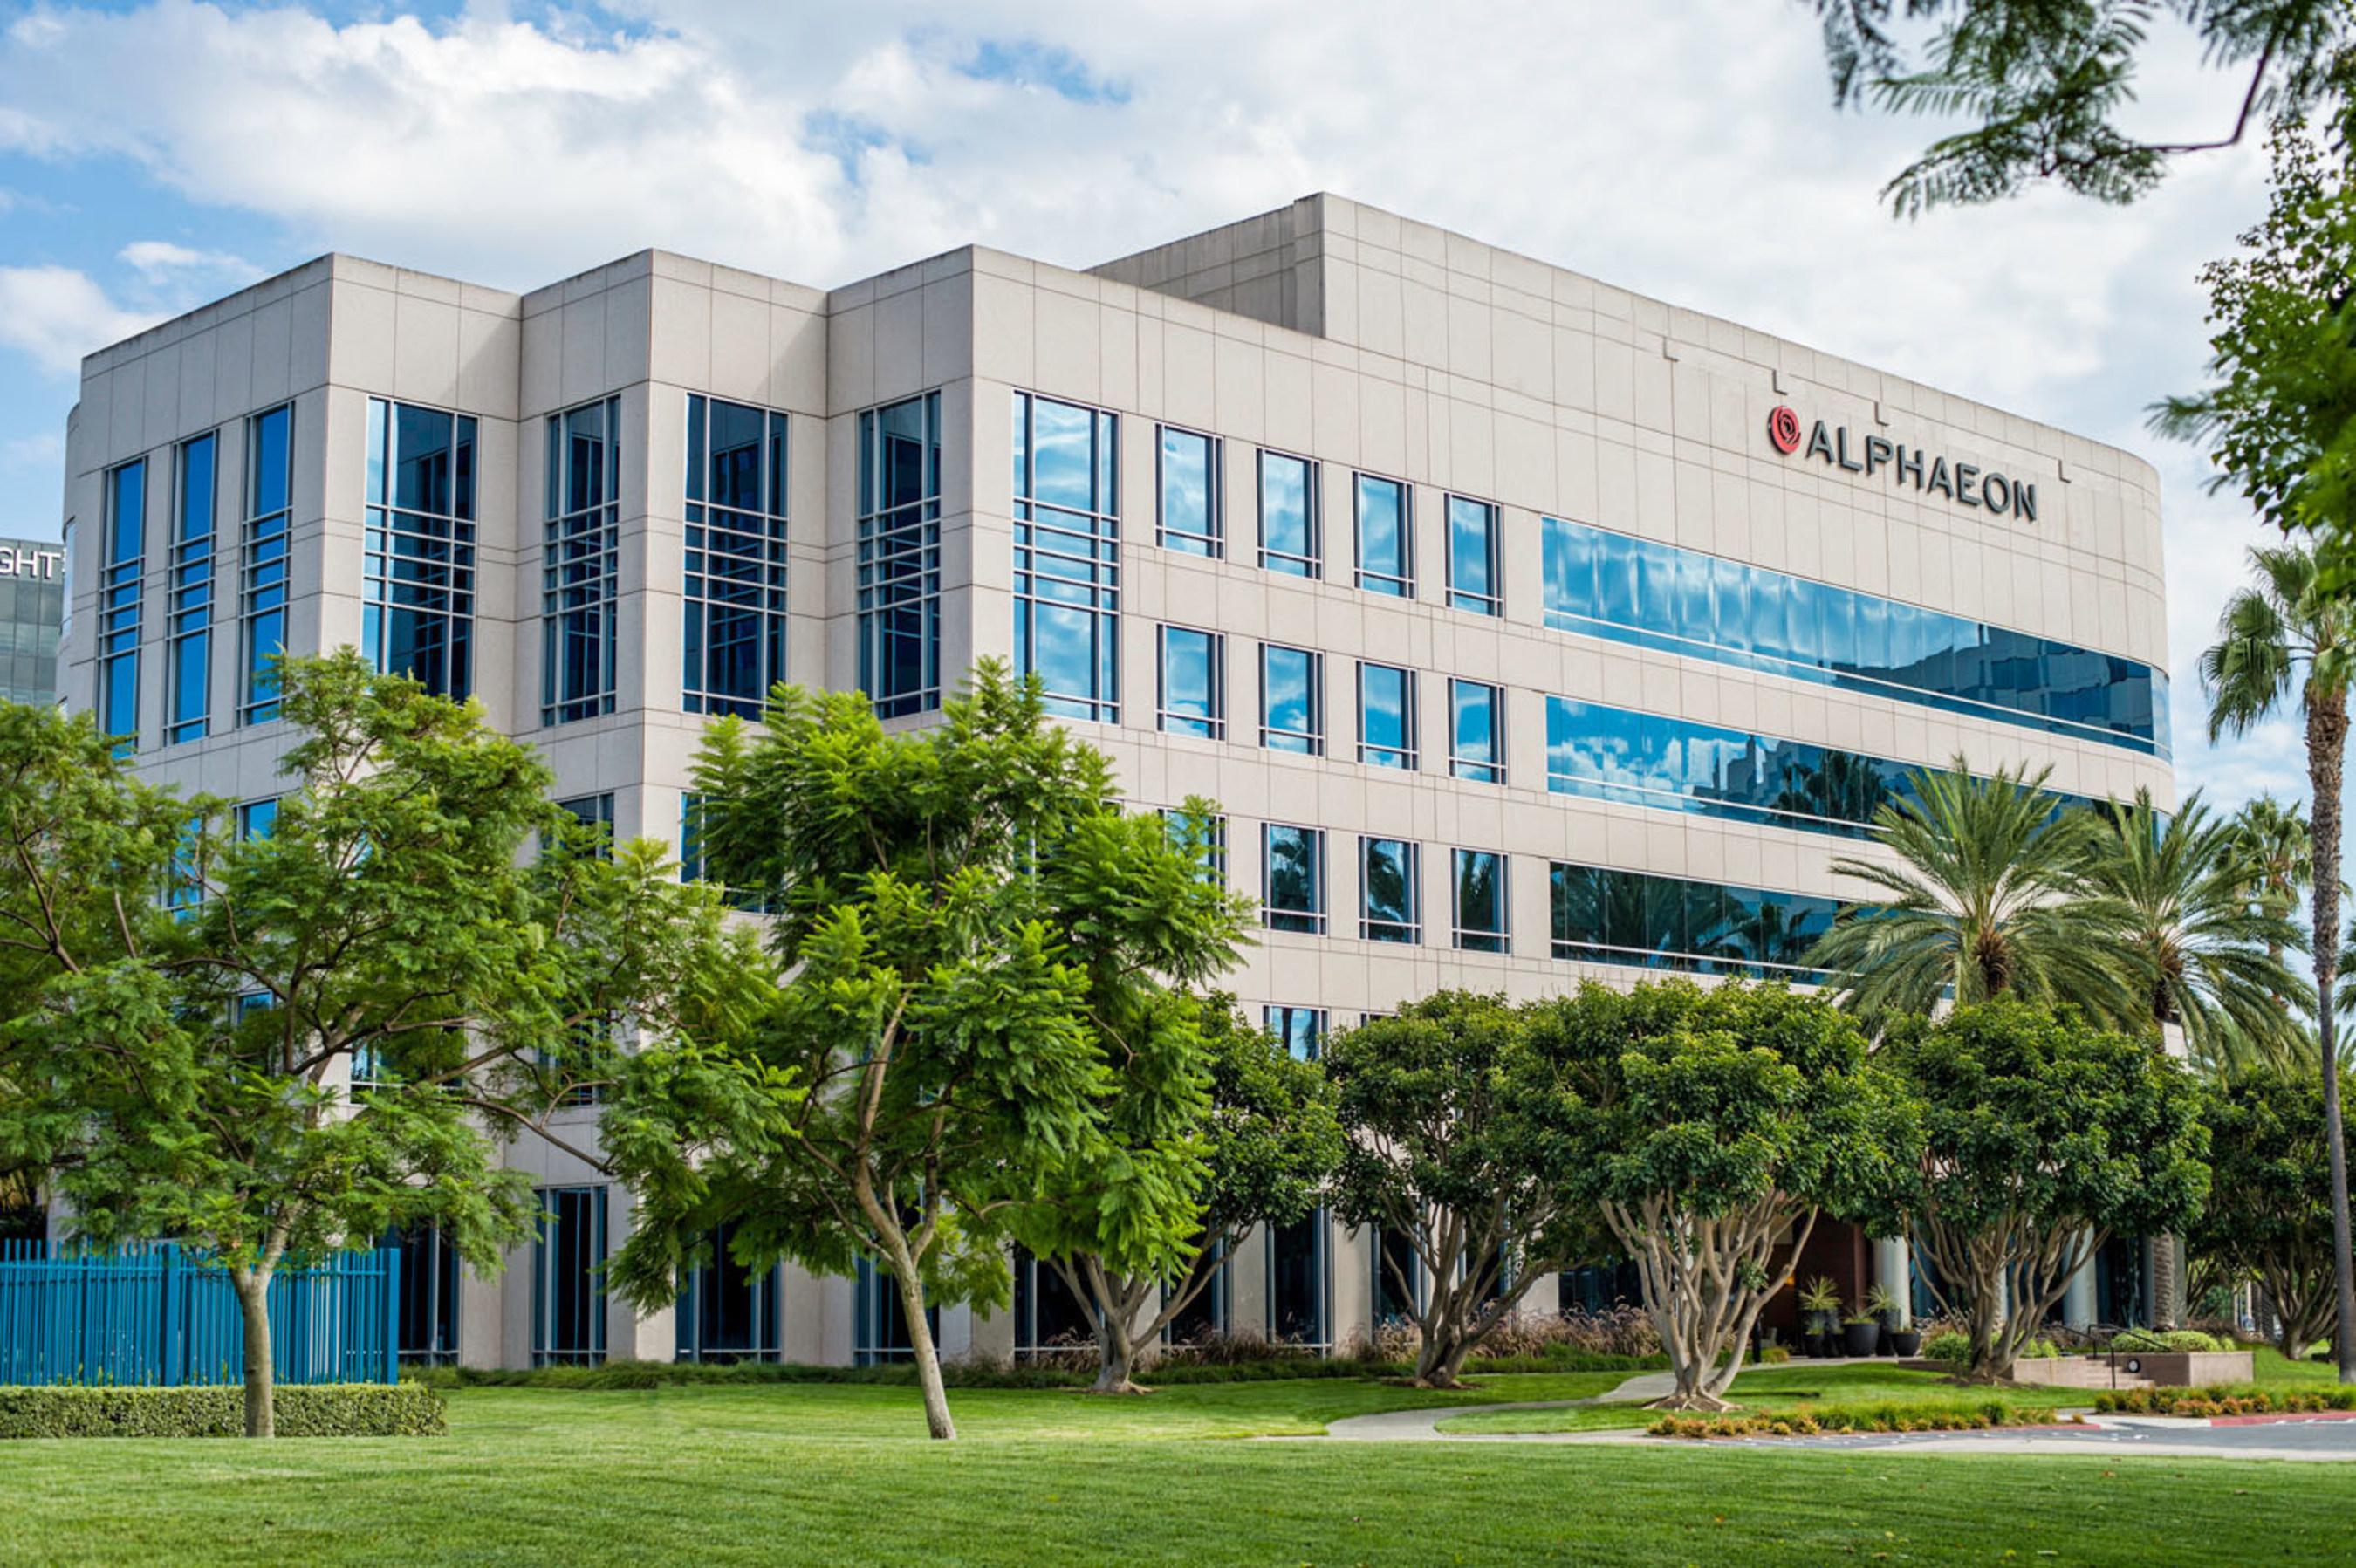 ALPHAEON(R) Corporation, Irvine, CA